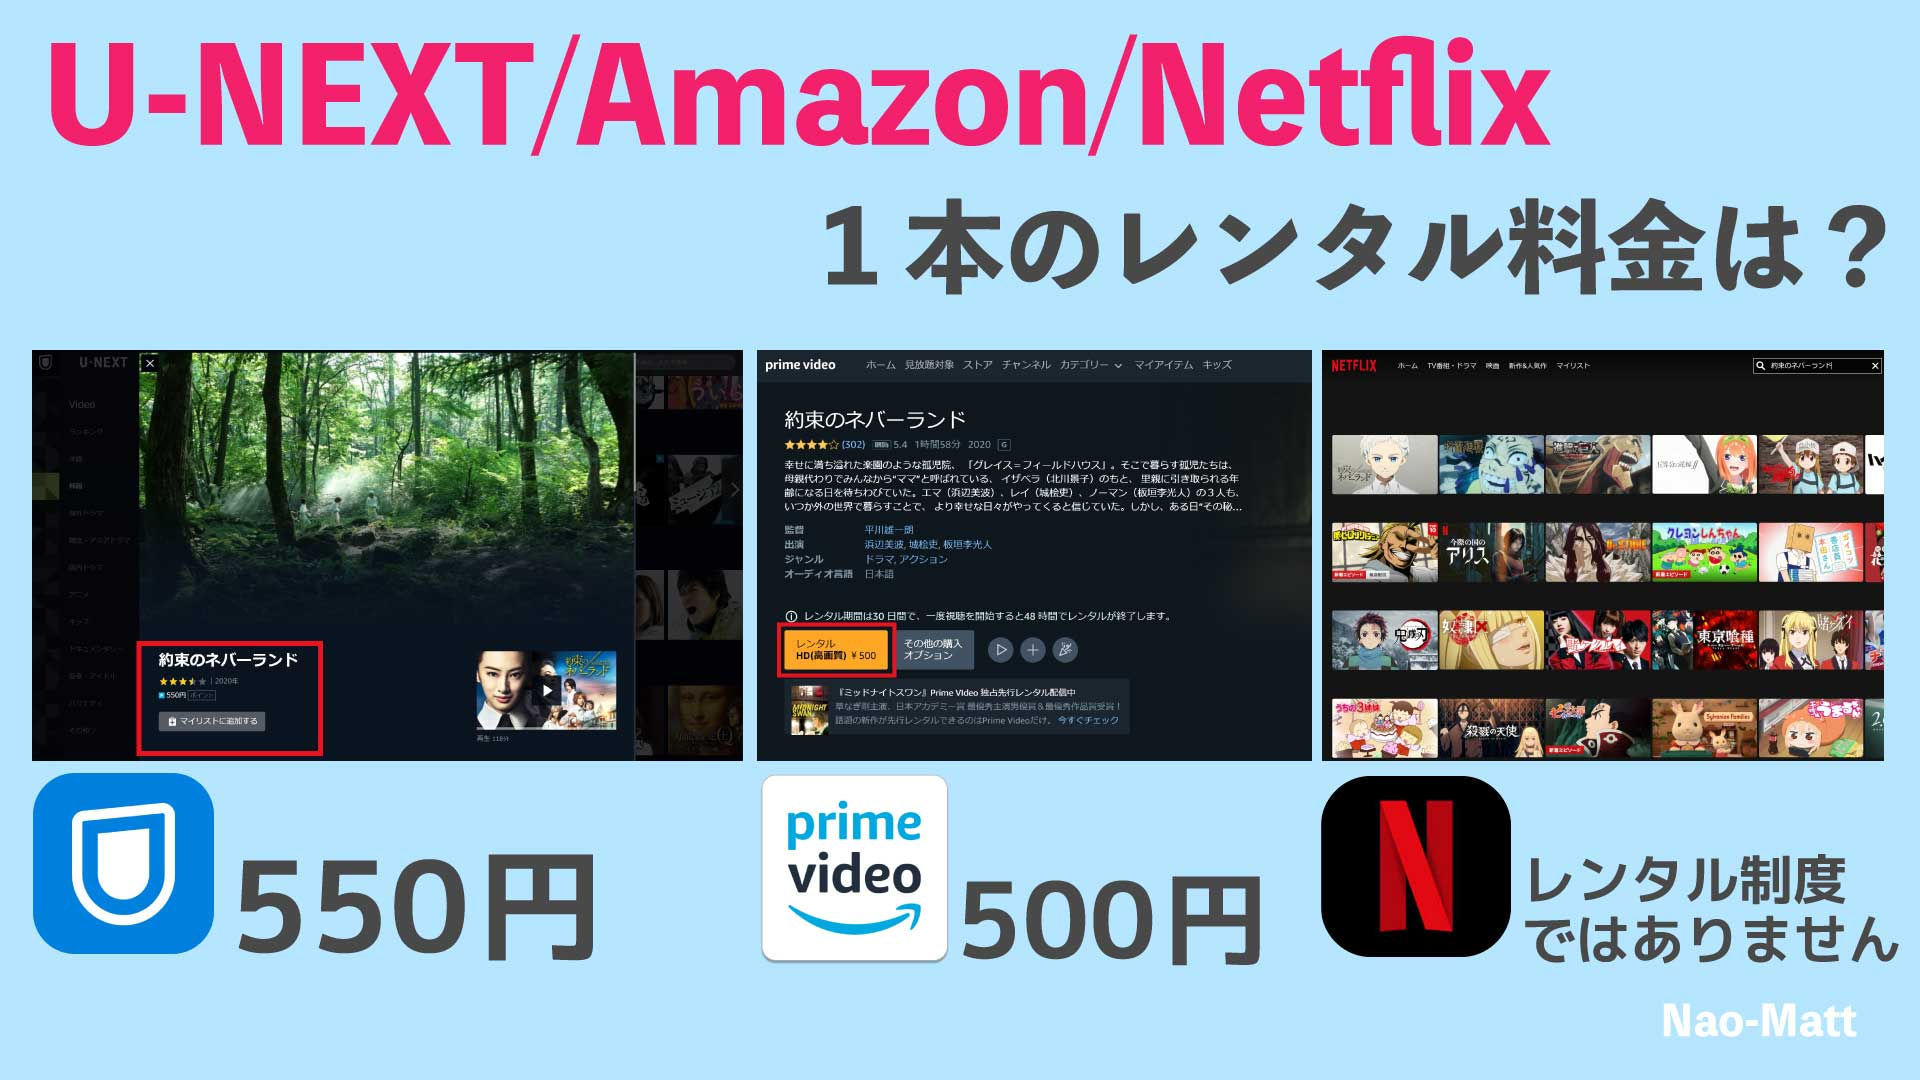 U-NEXTは550円Amazonは500円の証拠写真です